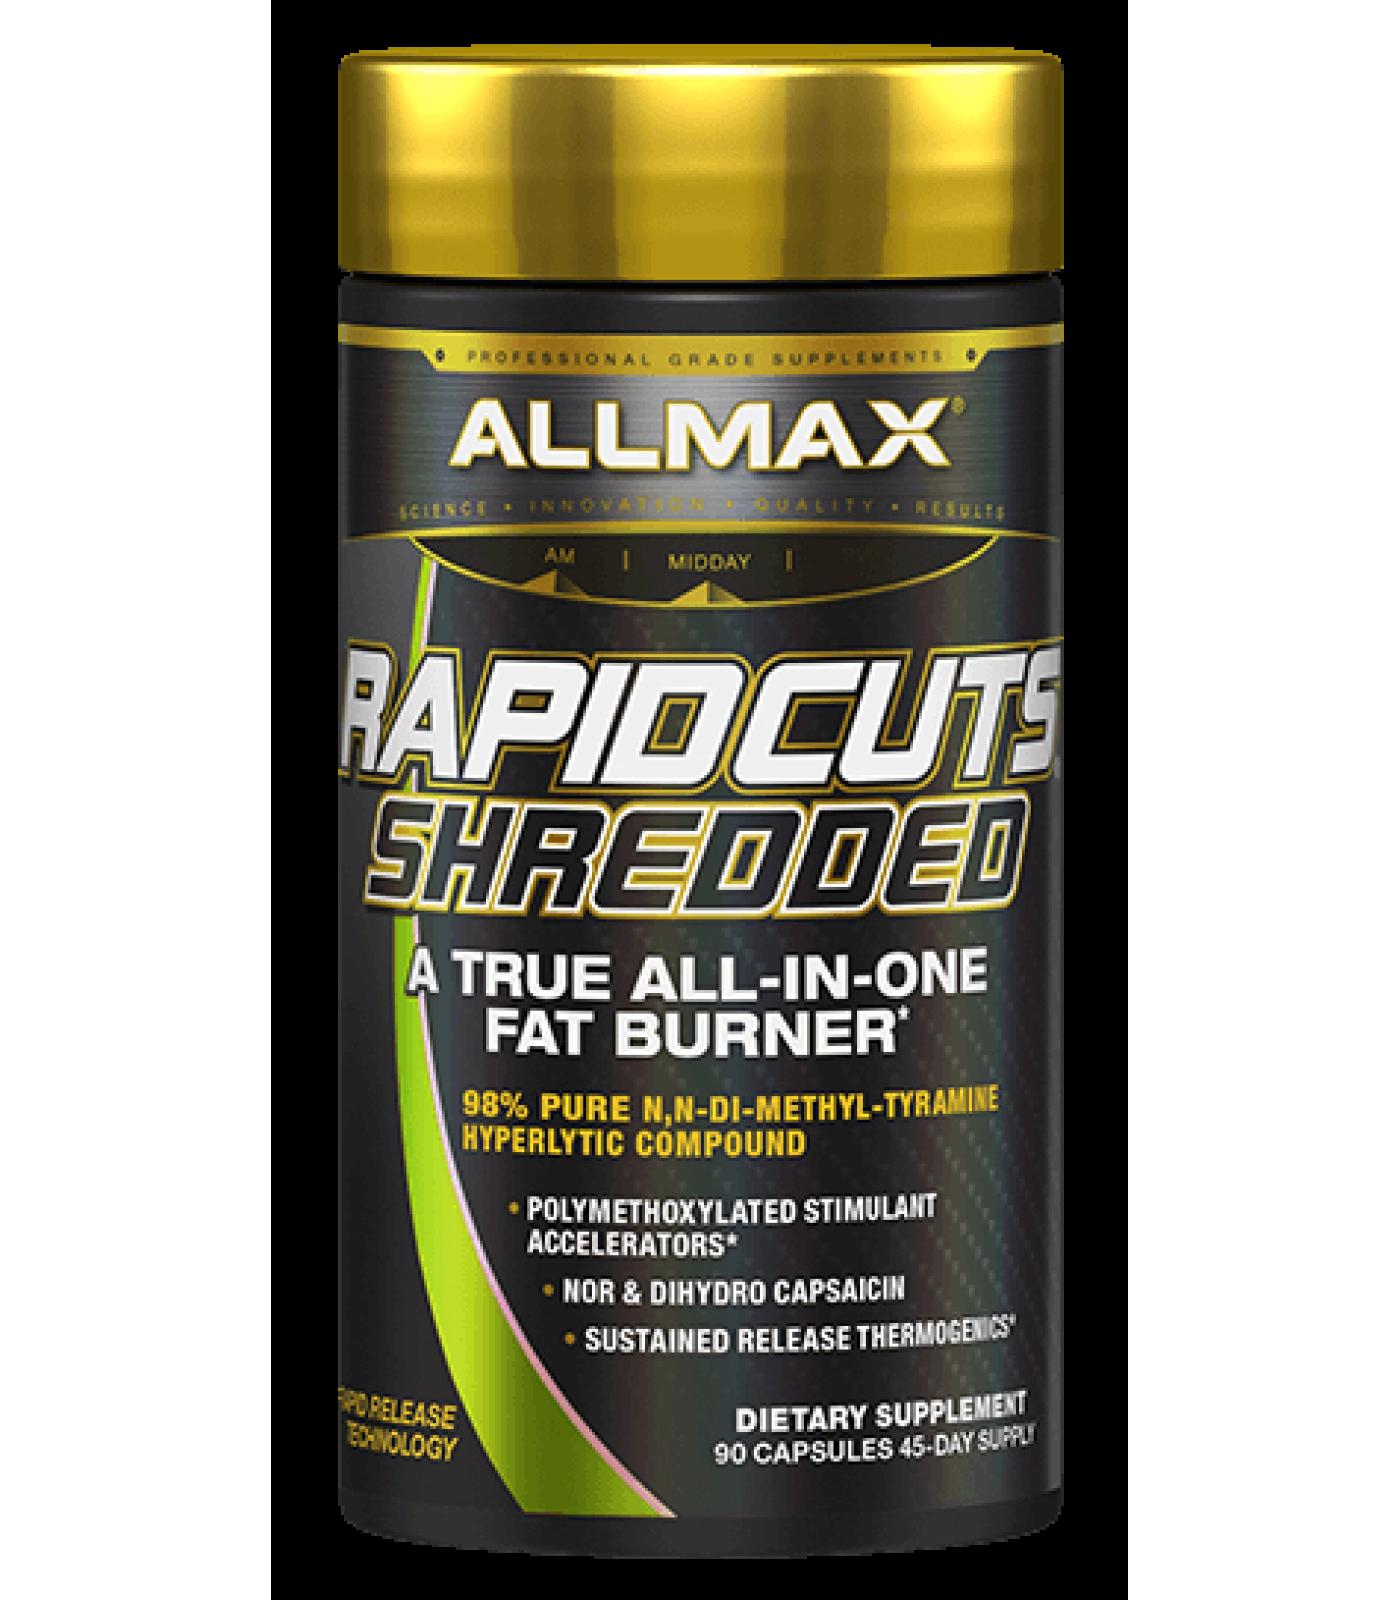 AllMax - RapidCuts Shredded / 90caps.